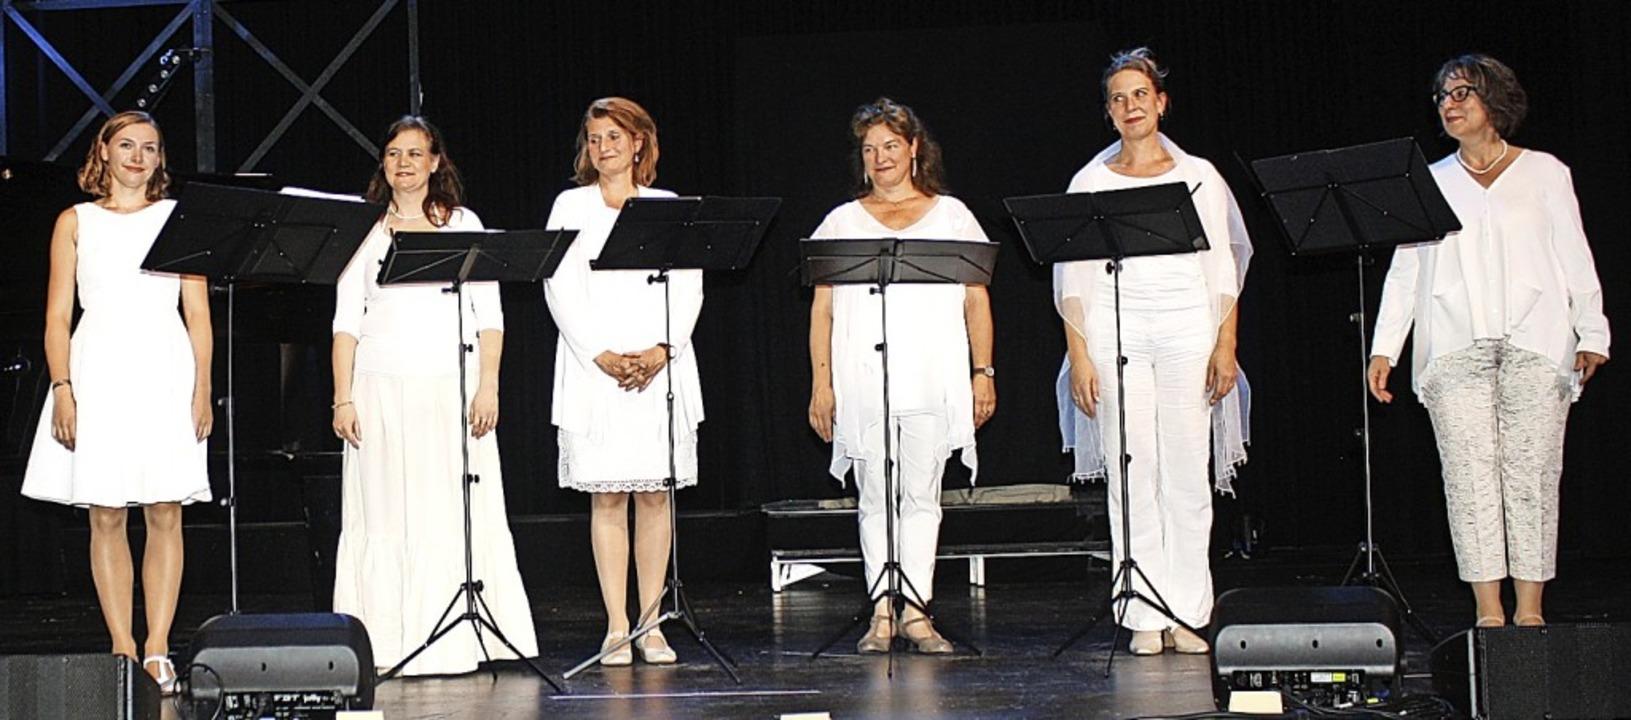 Das Ensemble Vocalisa Variable (Marlen...e Kniesel) nimmt den Applaus entgegen.  | Foto: Hildegard Karig